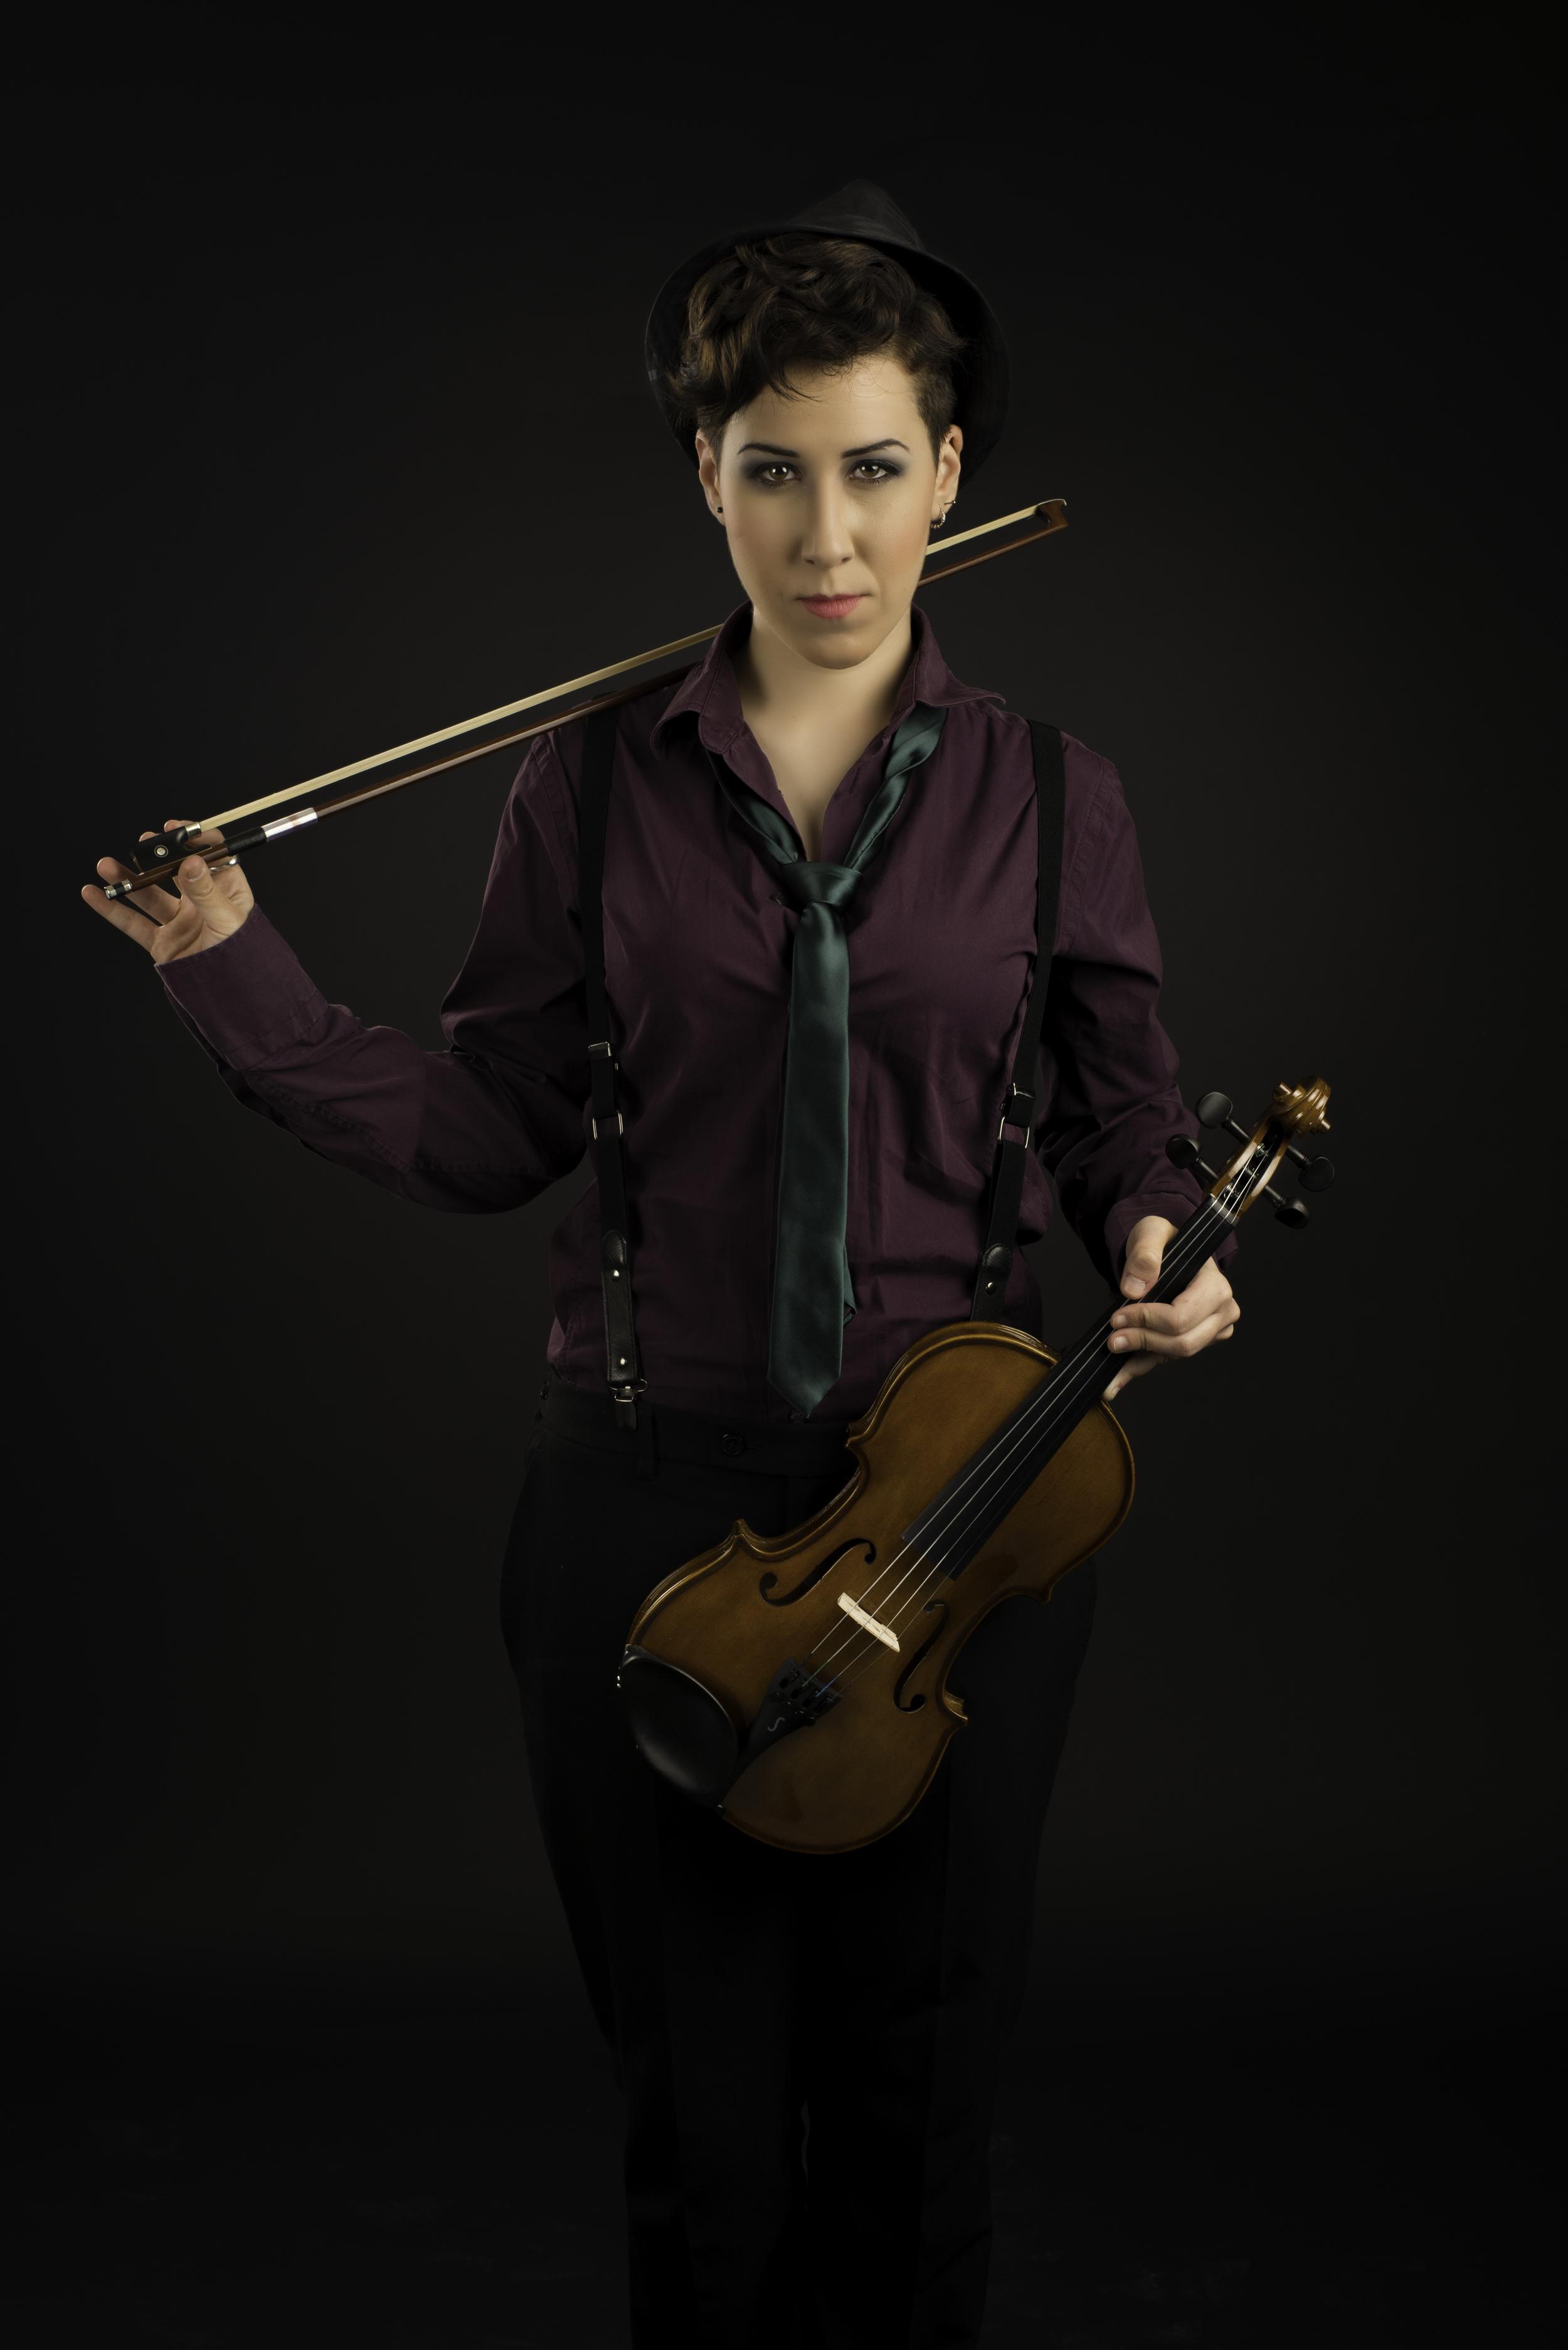 drew violin.jpg